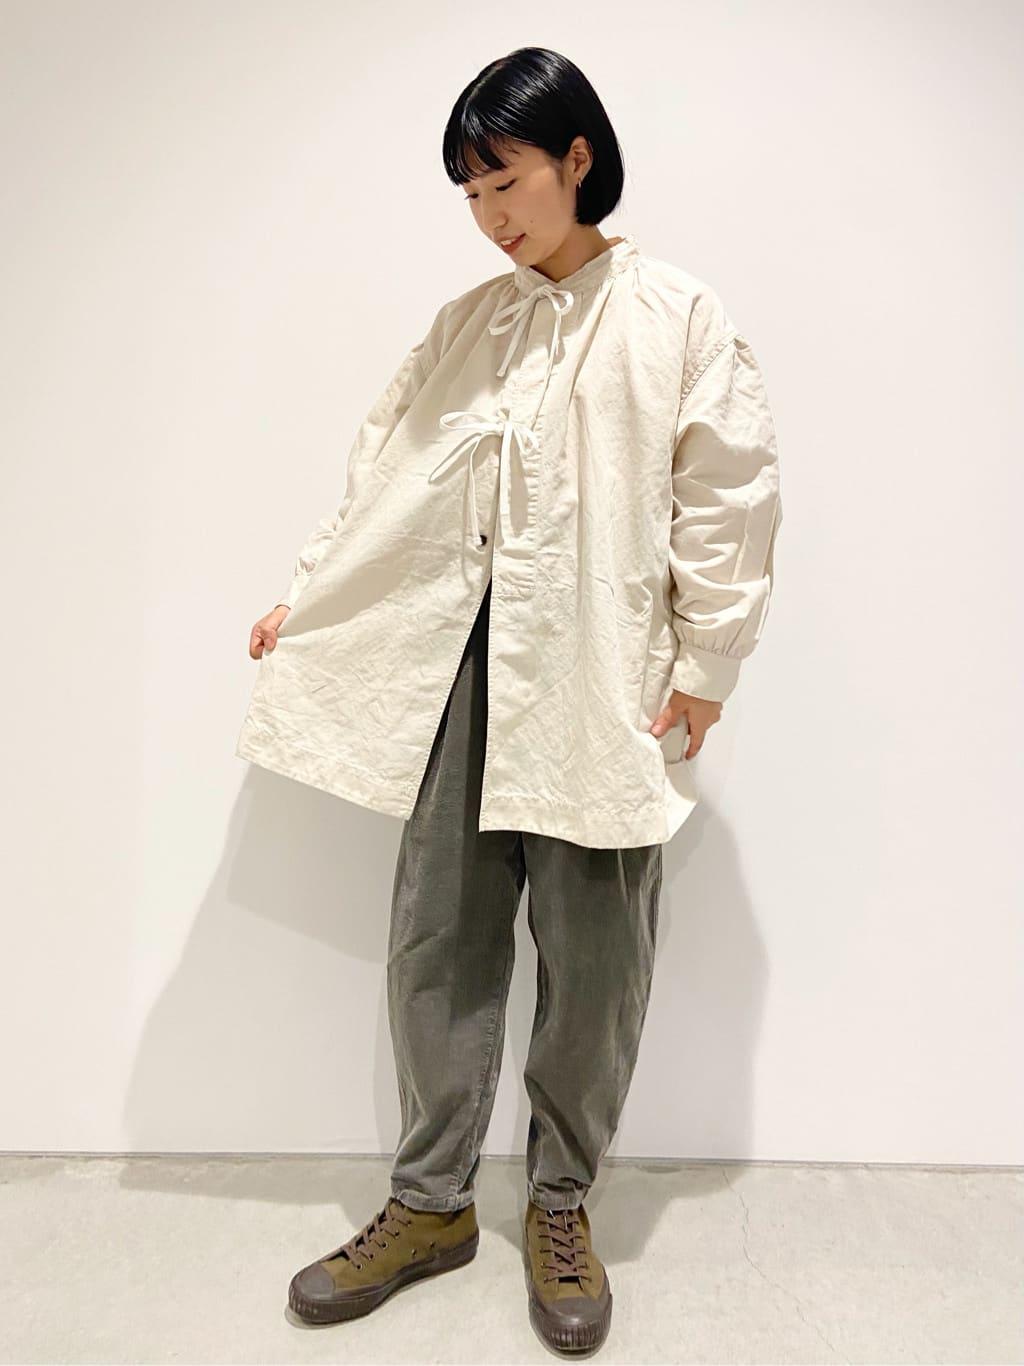 FLAT AMB 南堀江 2021.10.12